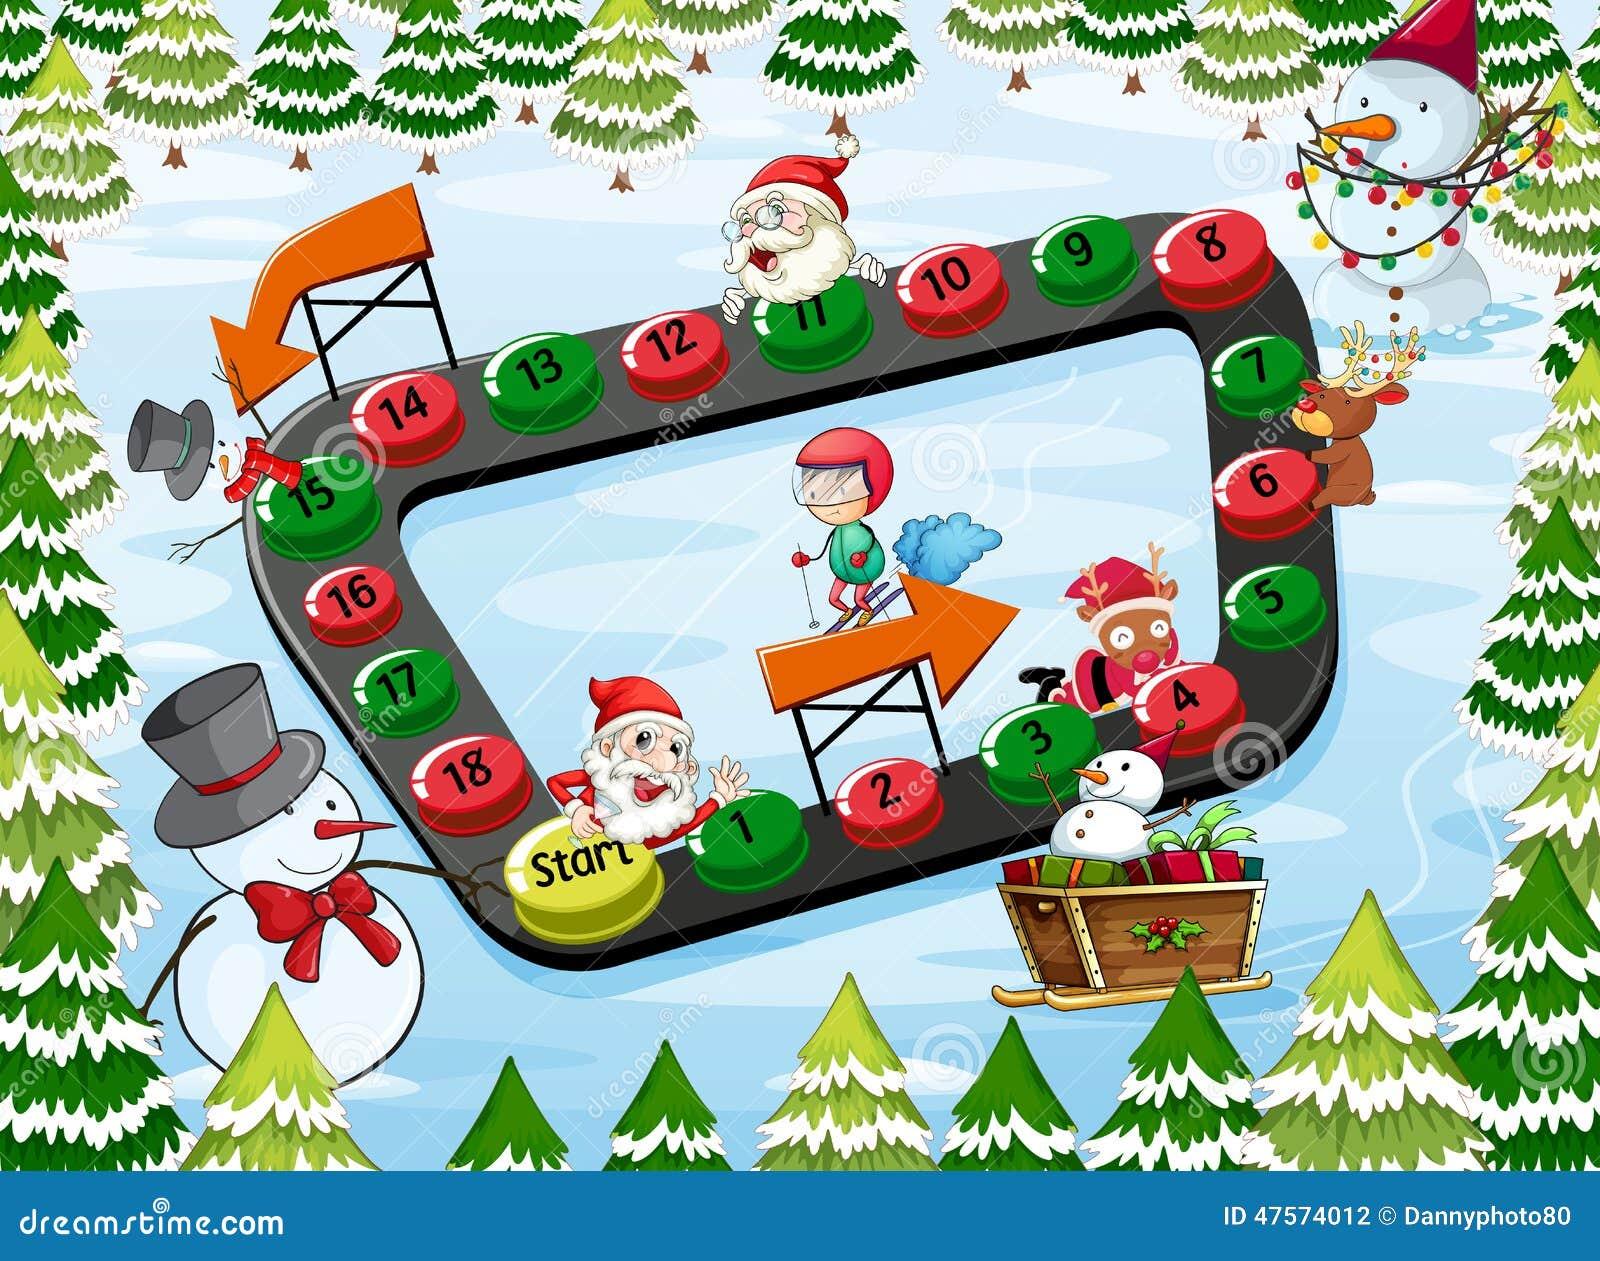 A Christmas Board Game Stock Vector - Image: 47574012